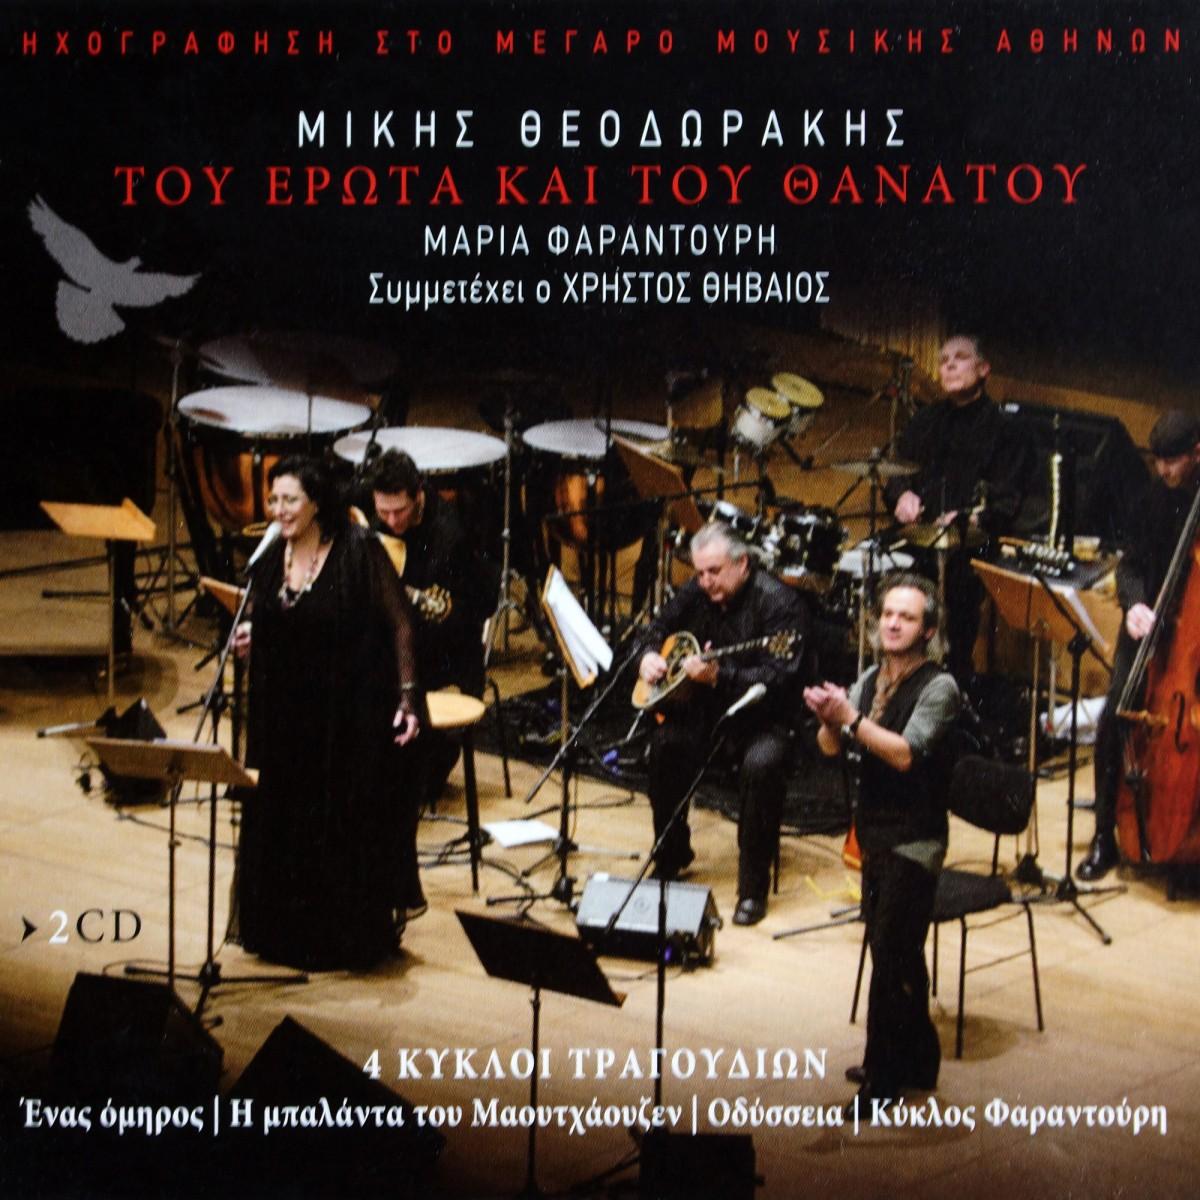 Farantouri, Maria: Του Έρωτα και του Θανάτου (2010)